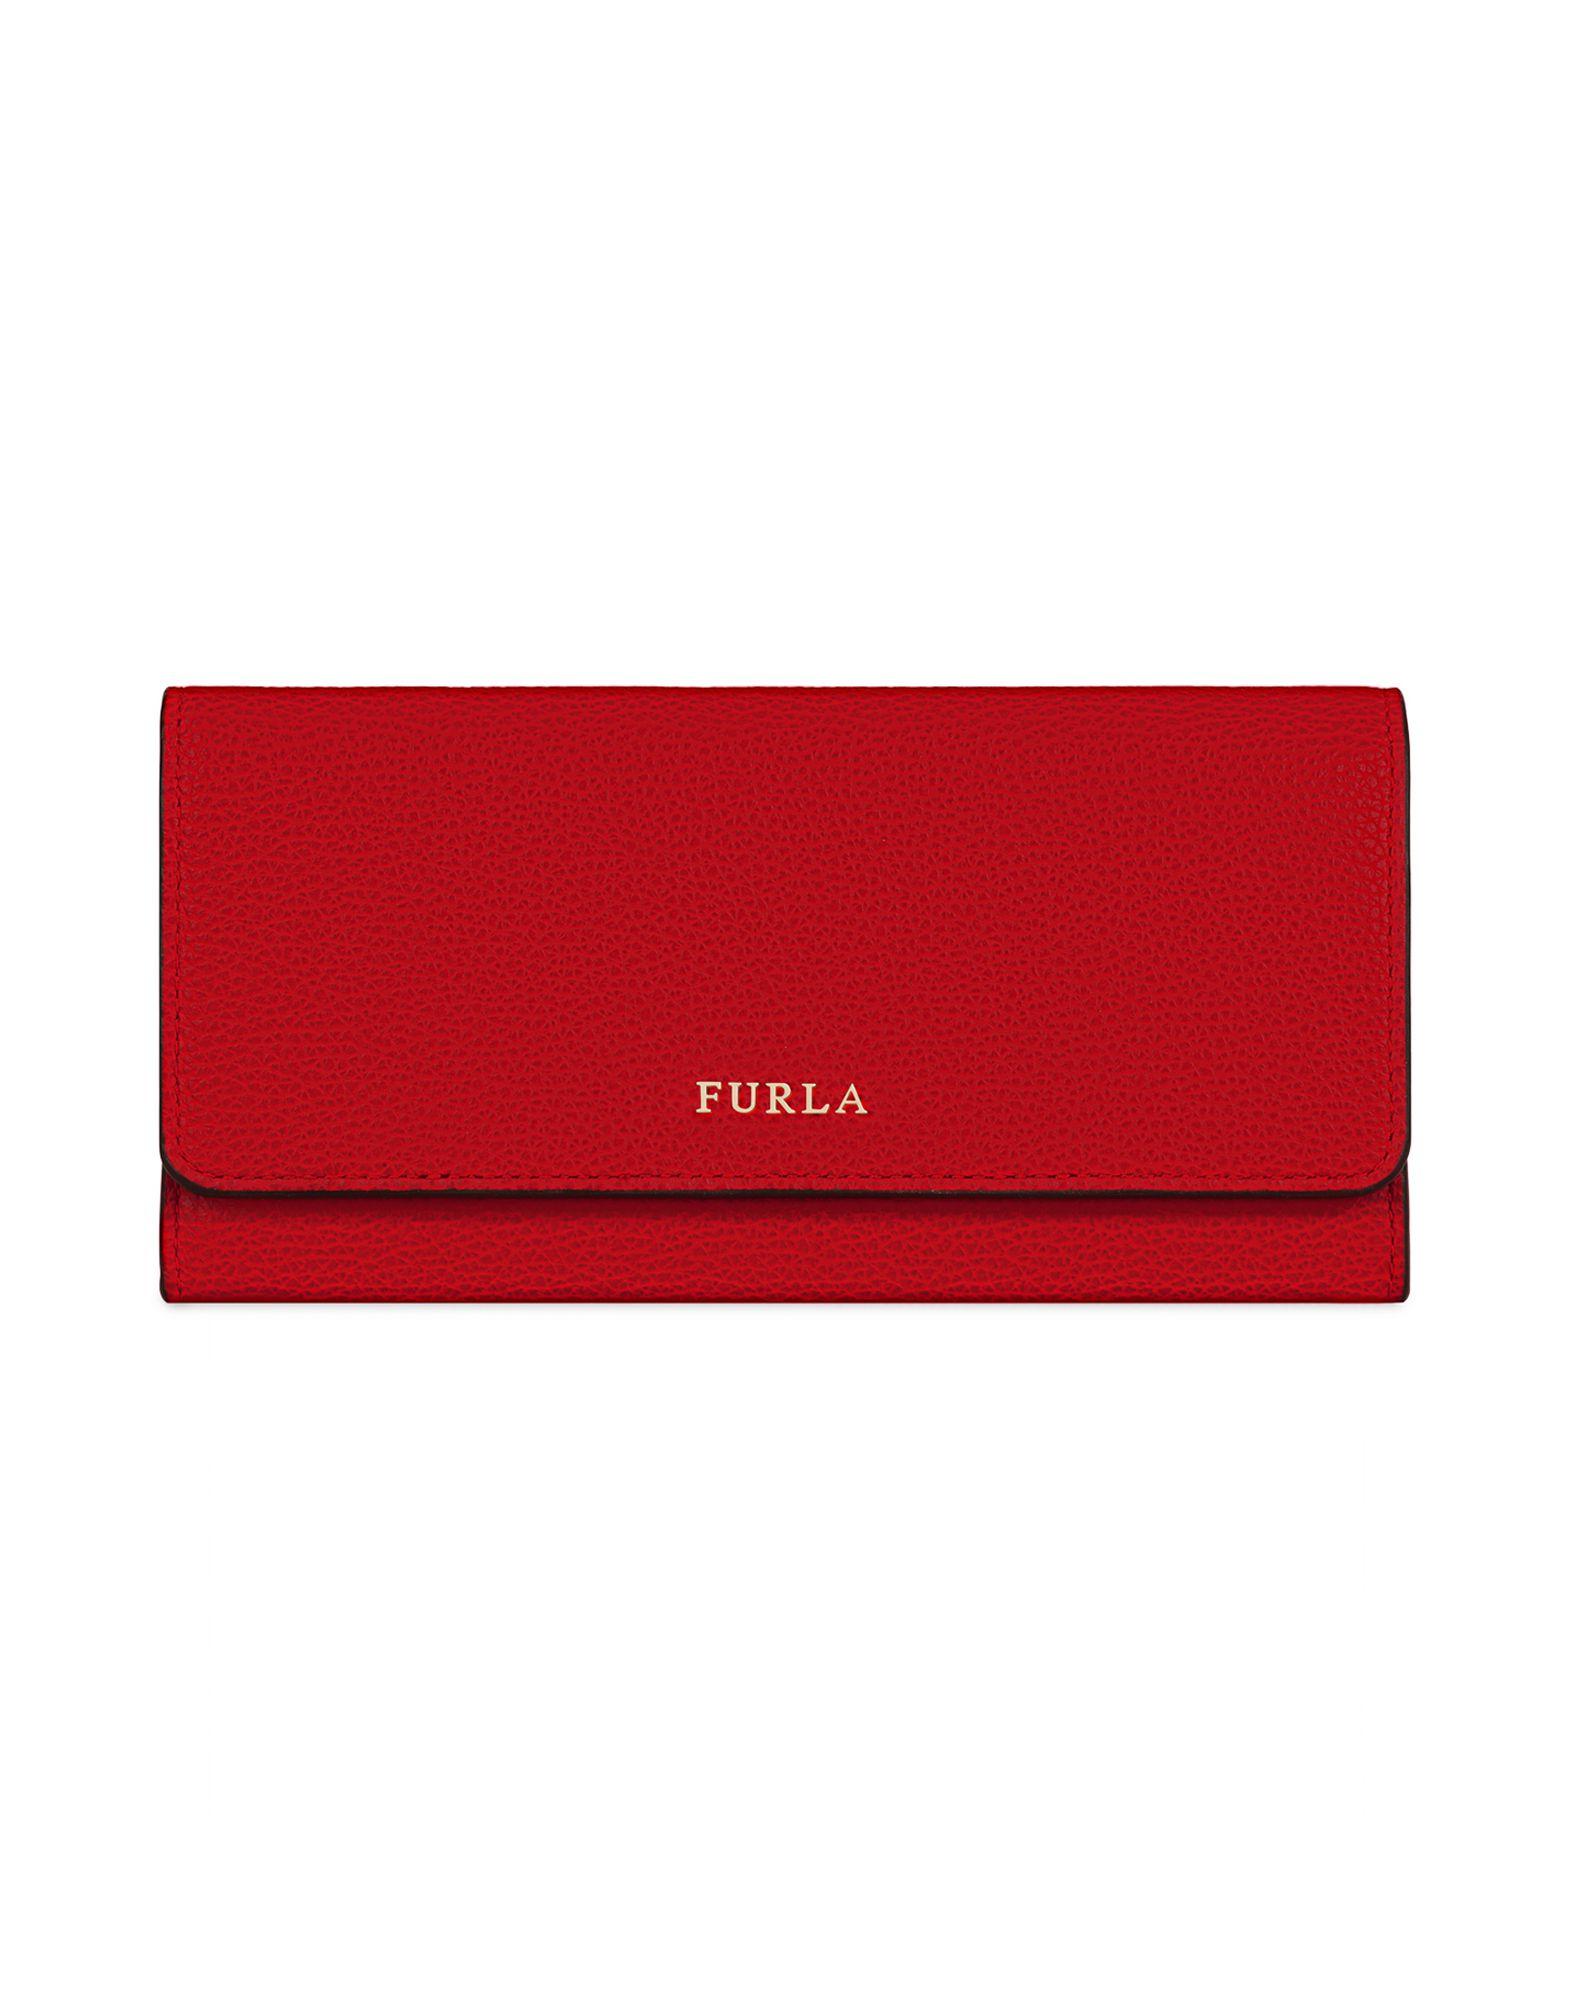 FURLA Бумажник кошелек furla furla fu003bwzle26